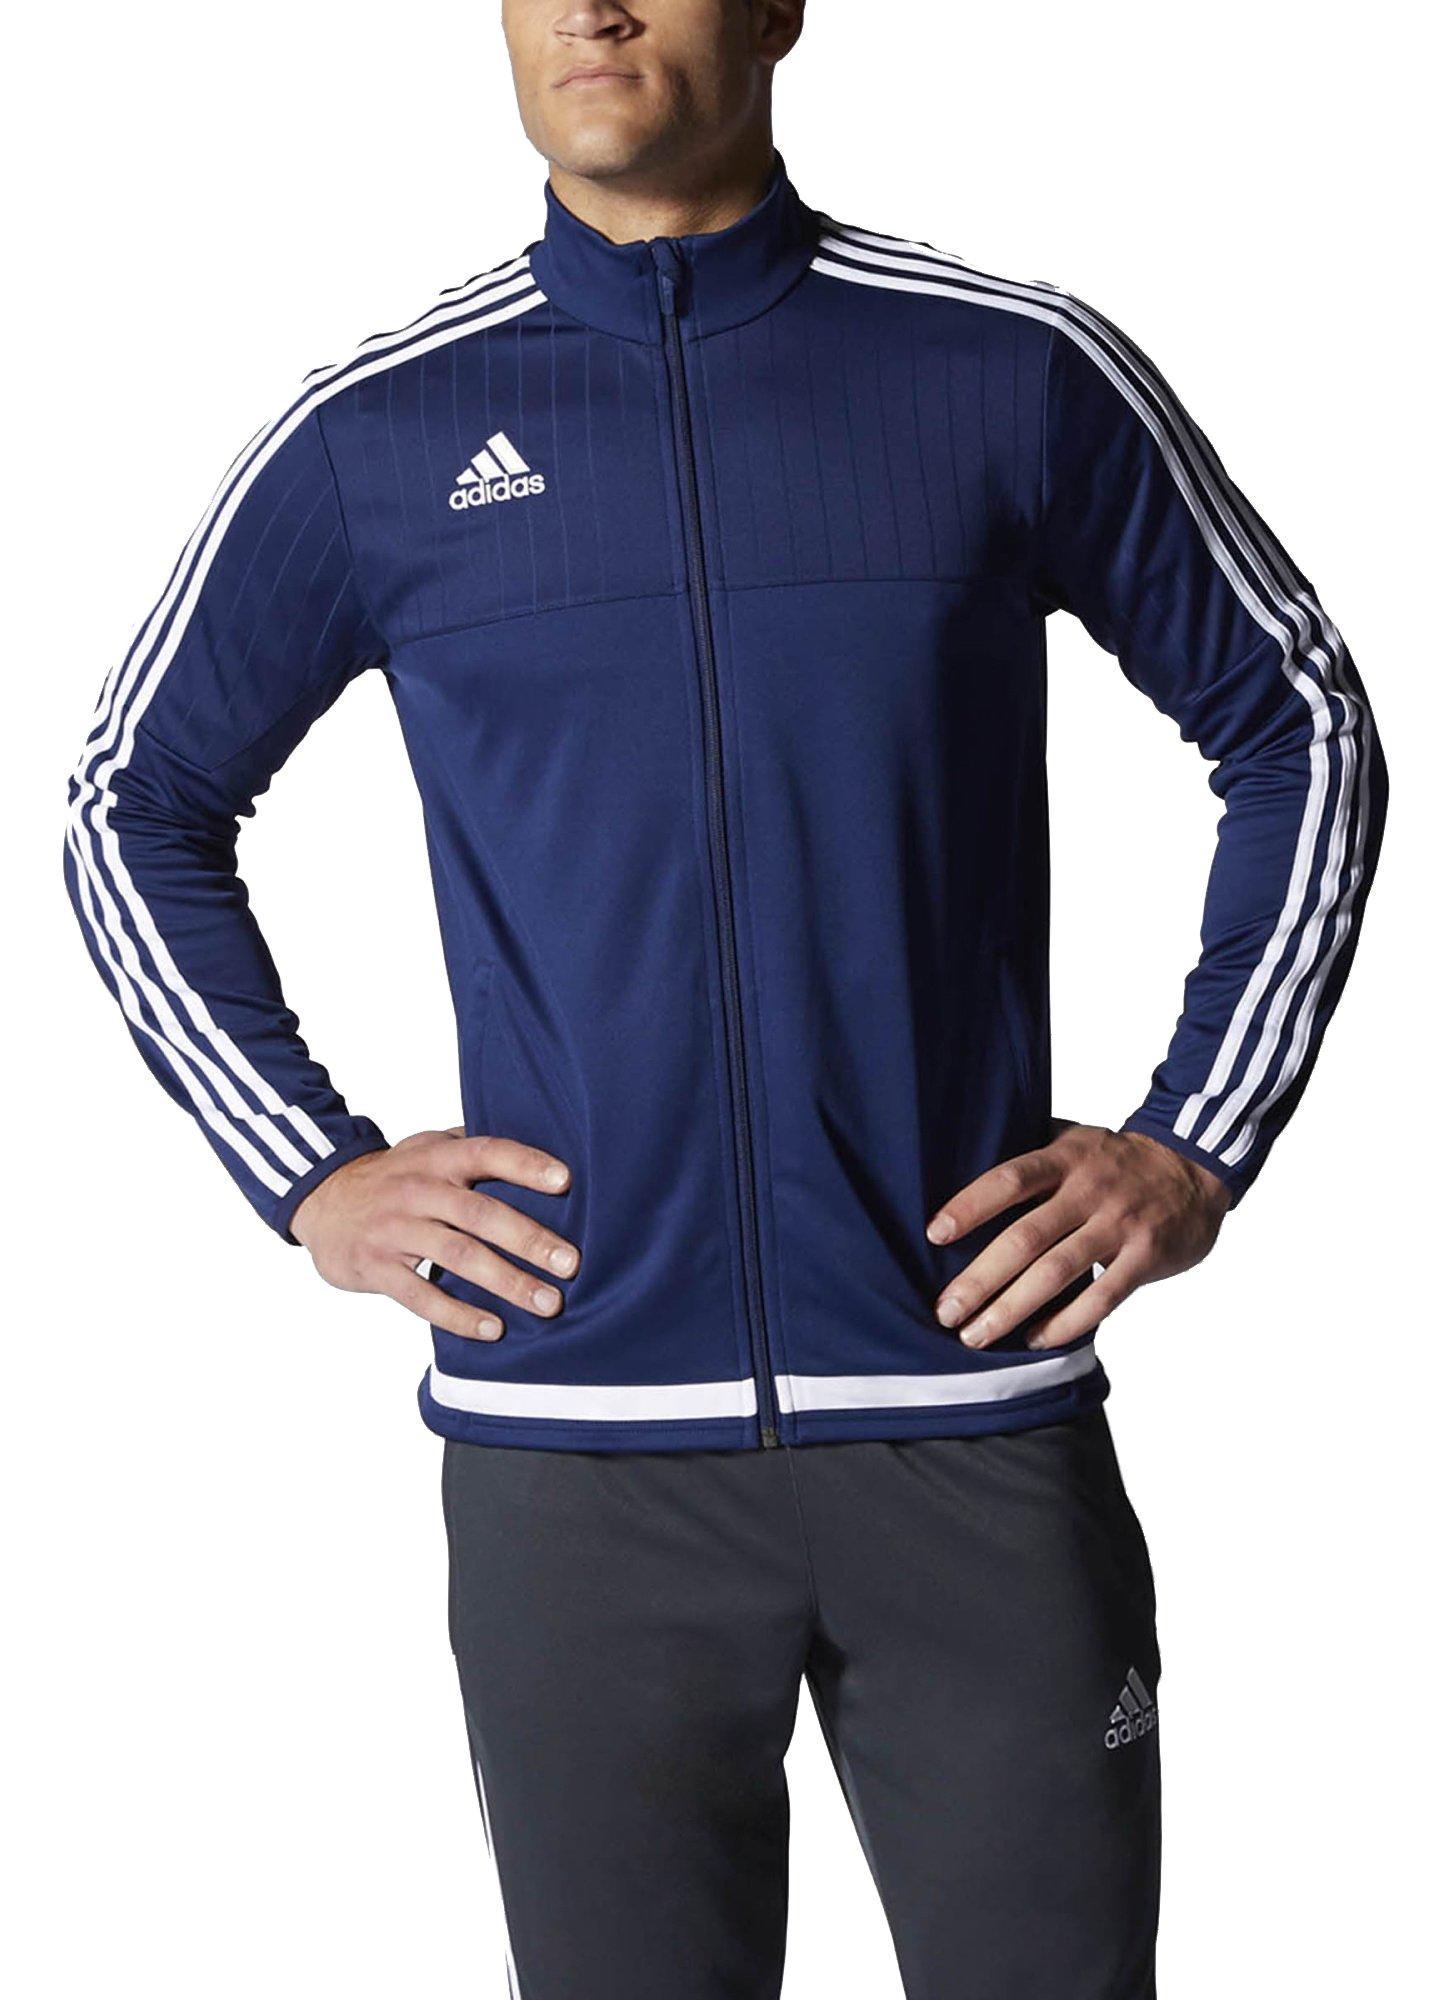 Tréninková bunda adidas Tiro 15